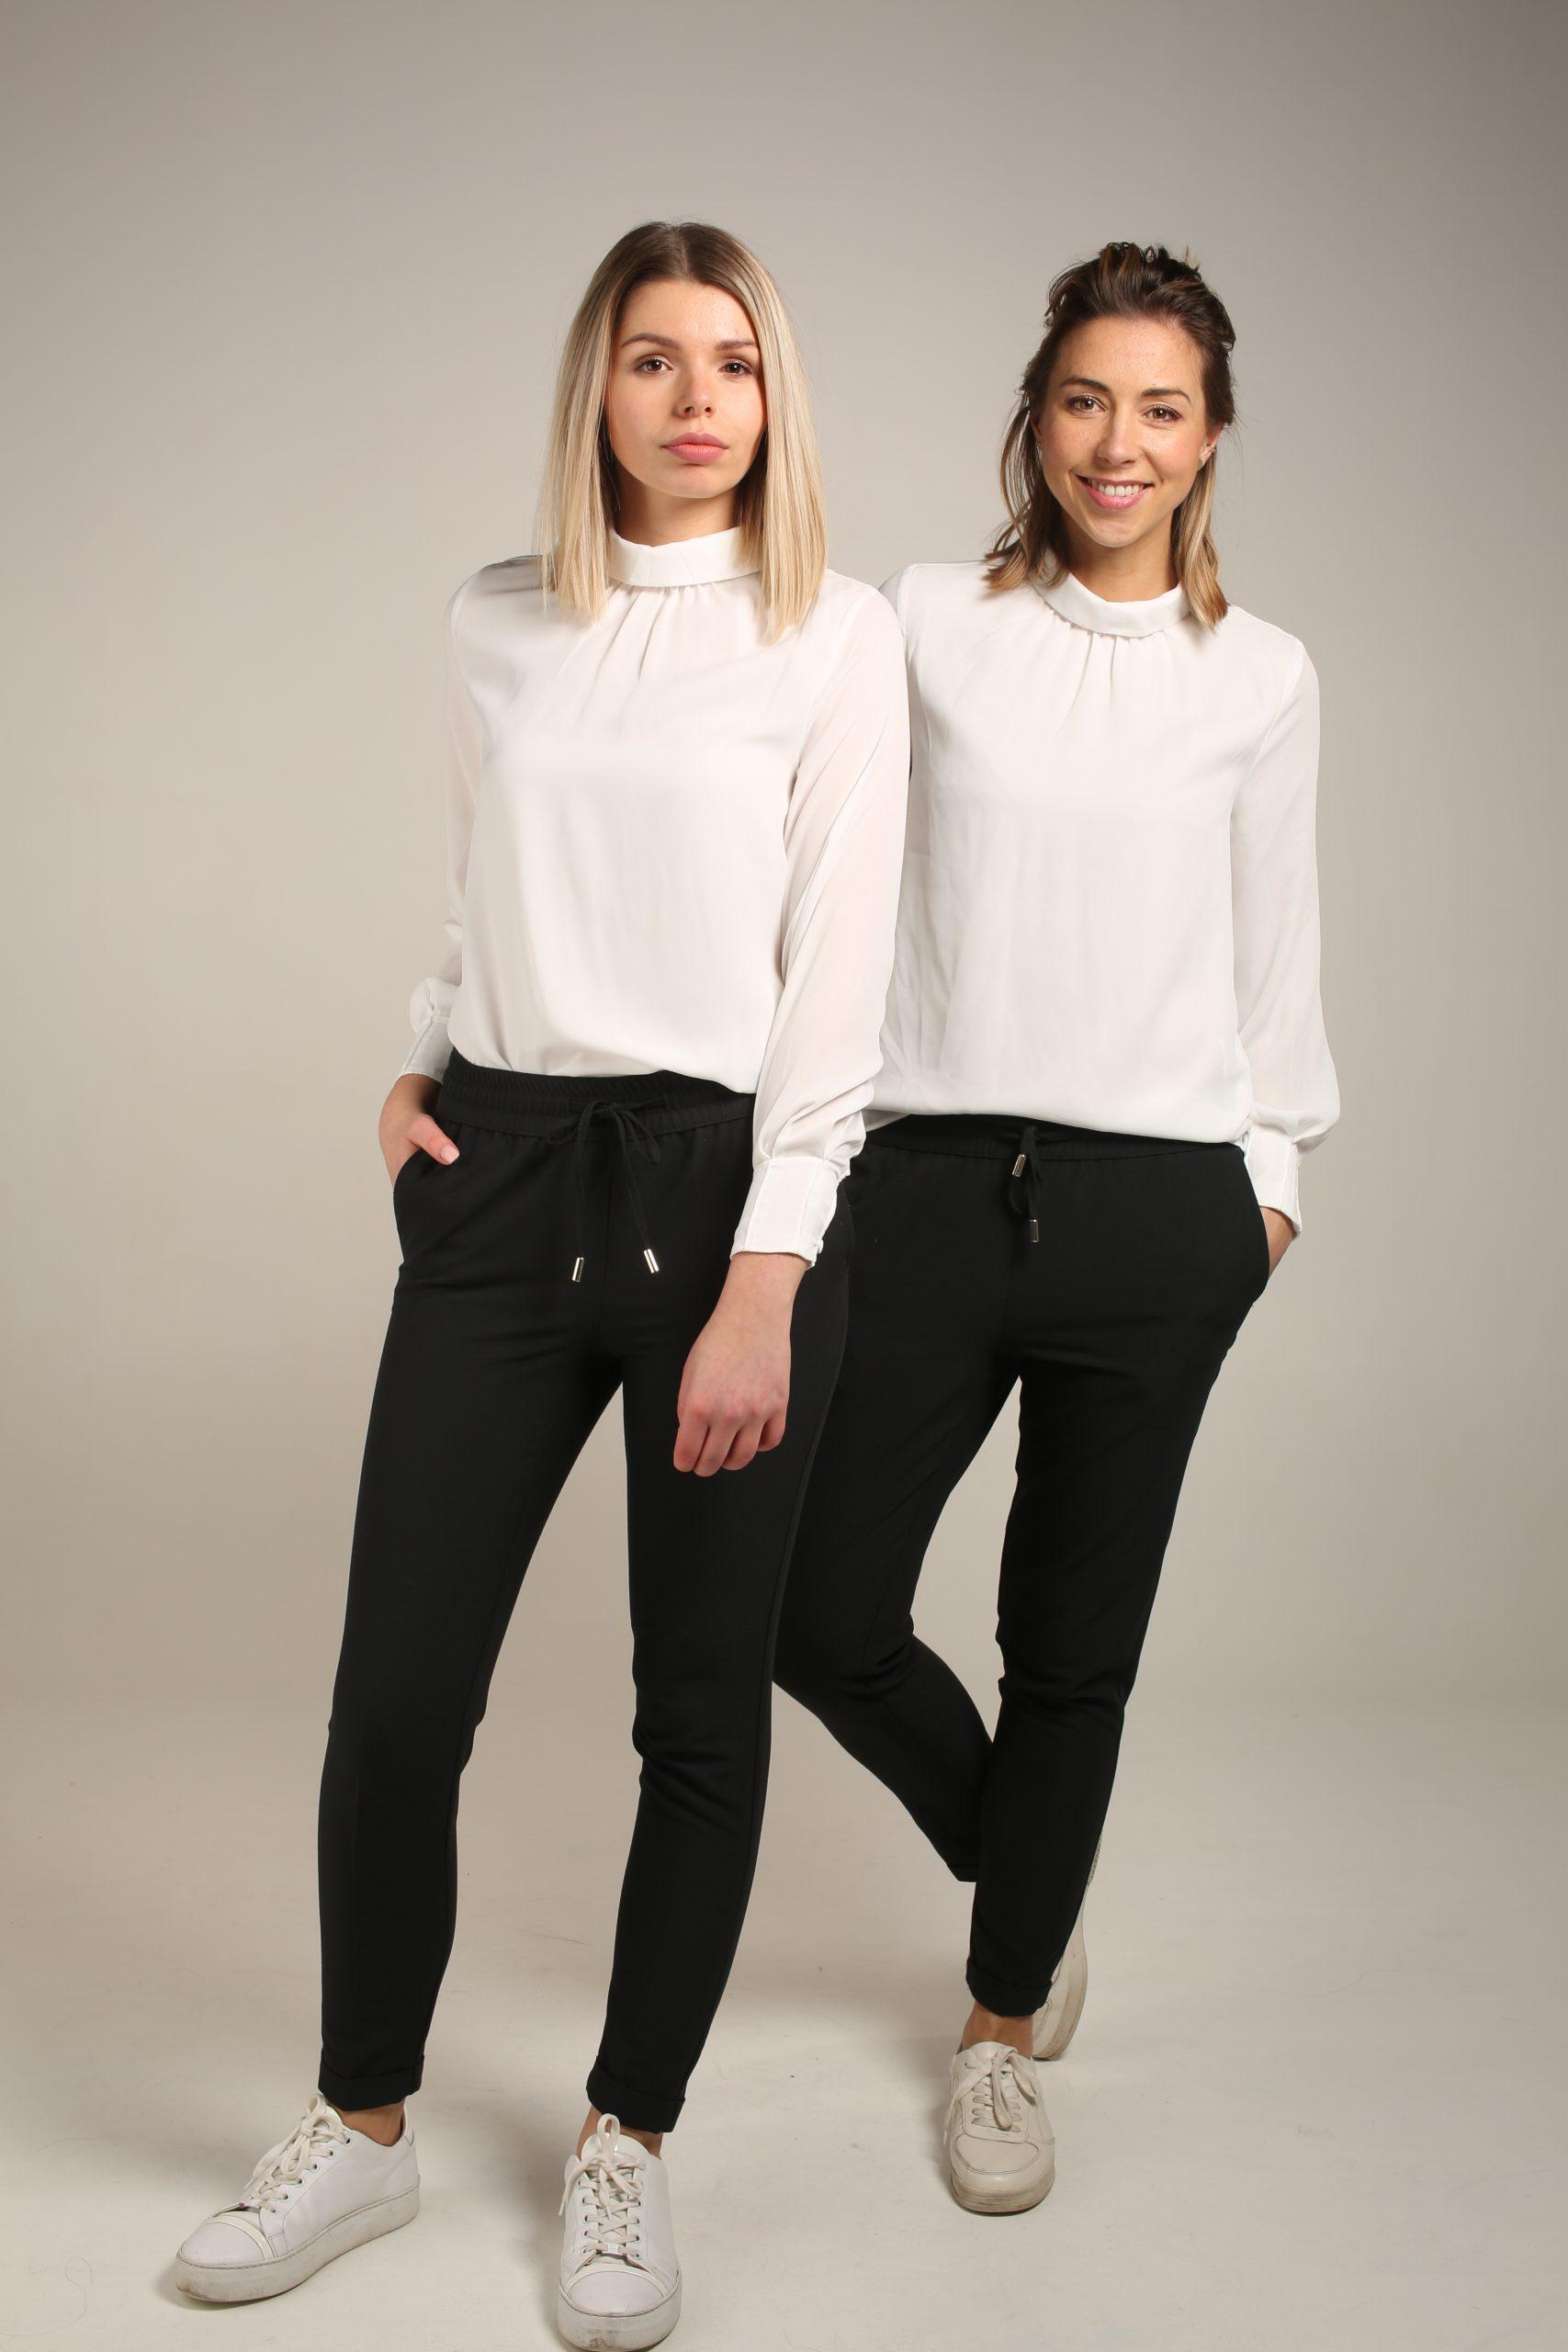 Zwarte broek & Witte blouse